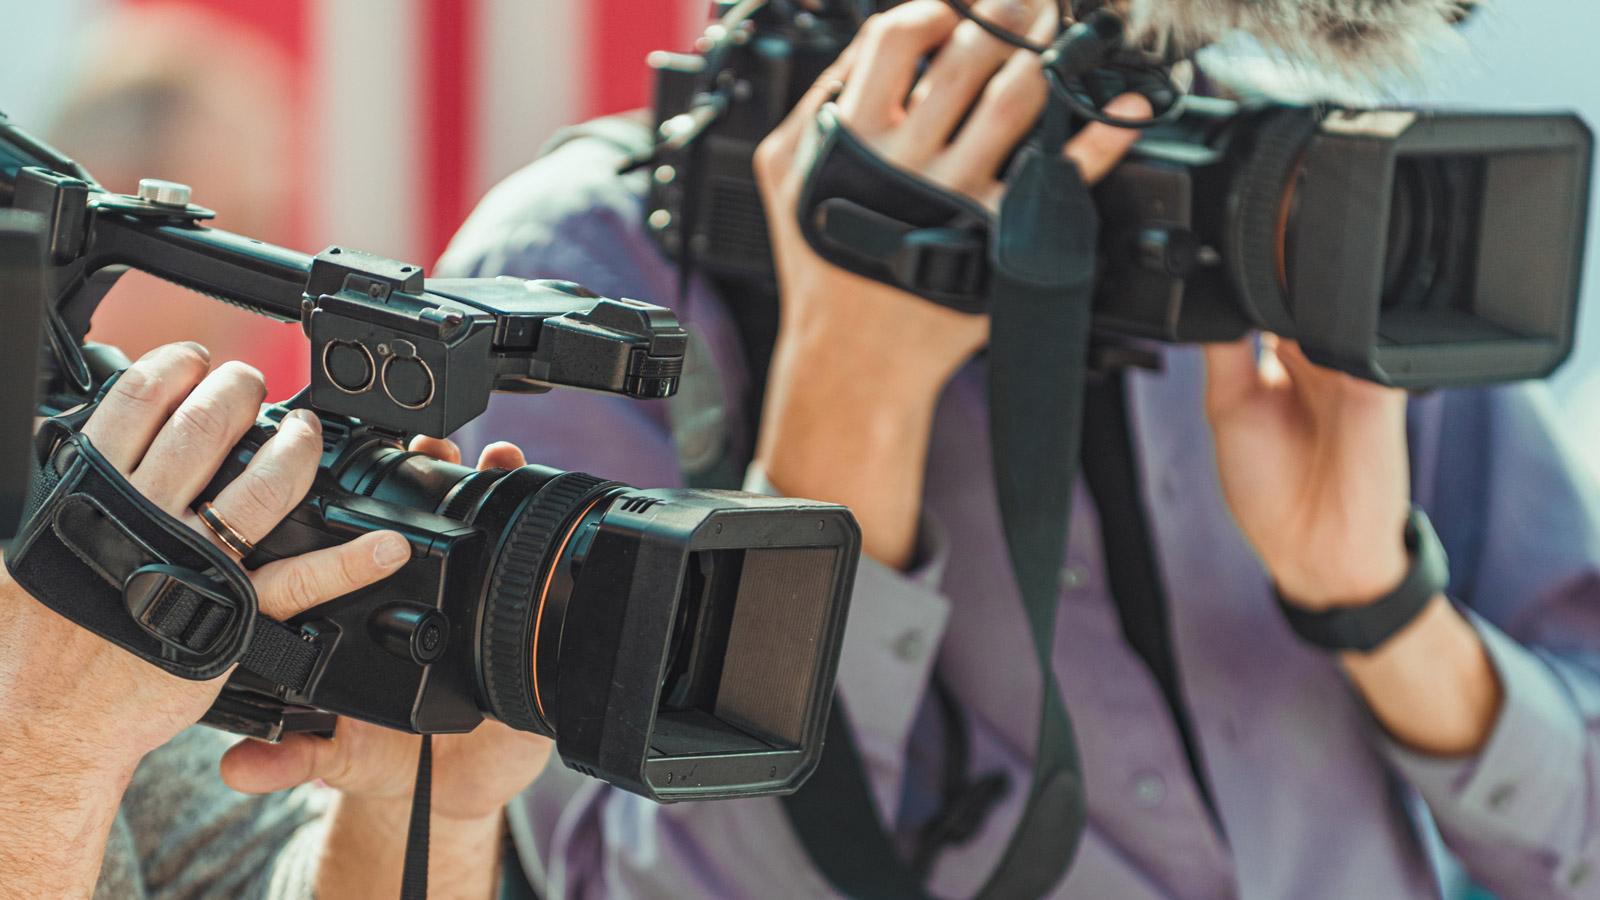 Jak zmienił się rynek mediów? TV mediarun kamera media rynek 2020